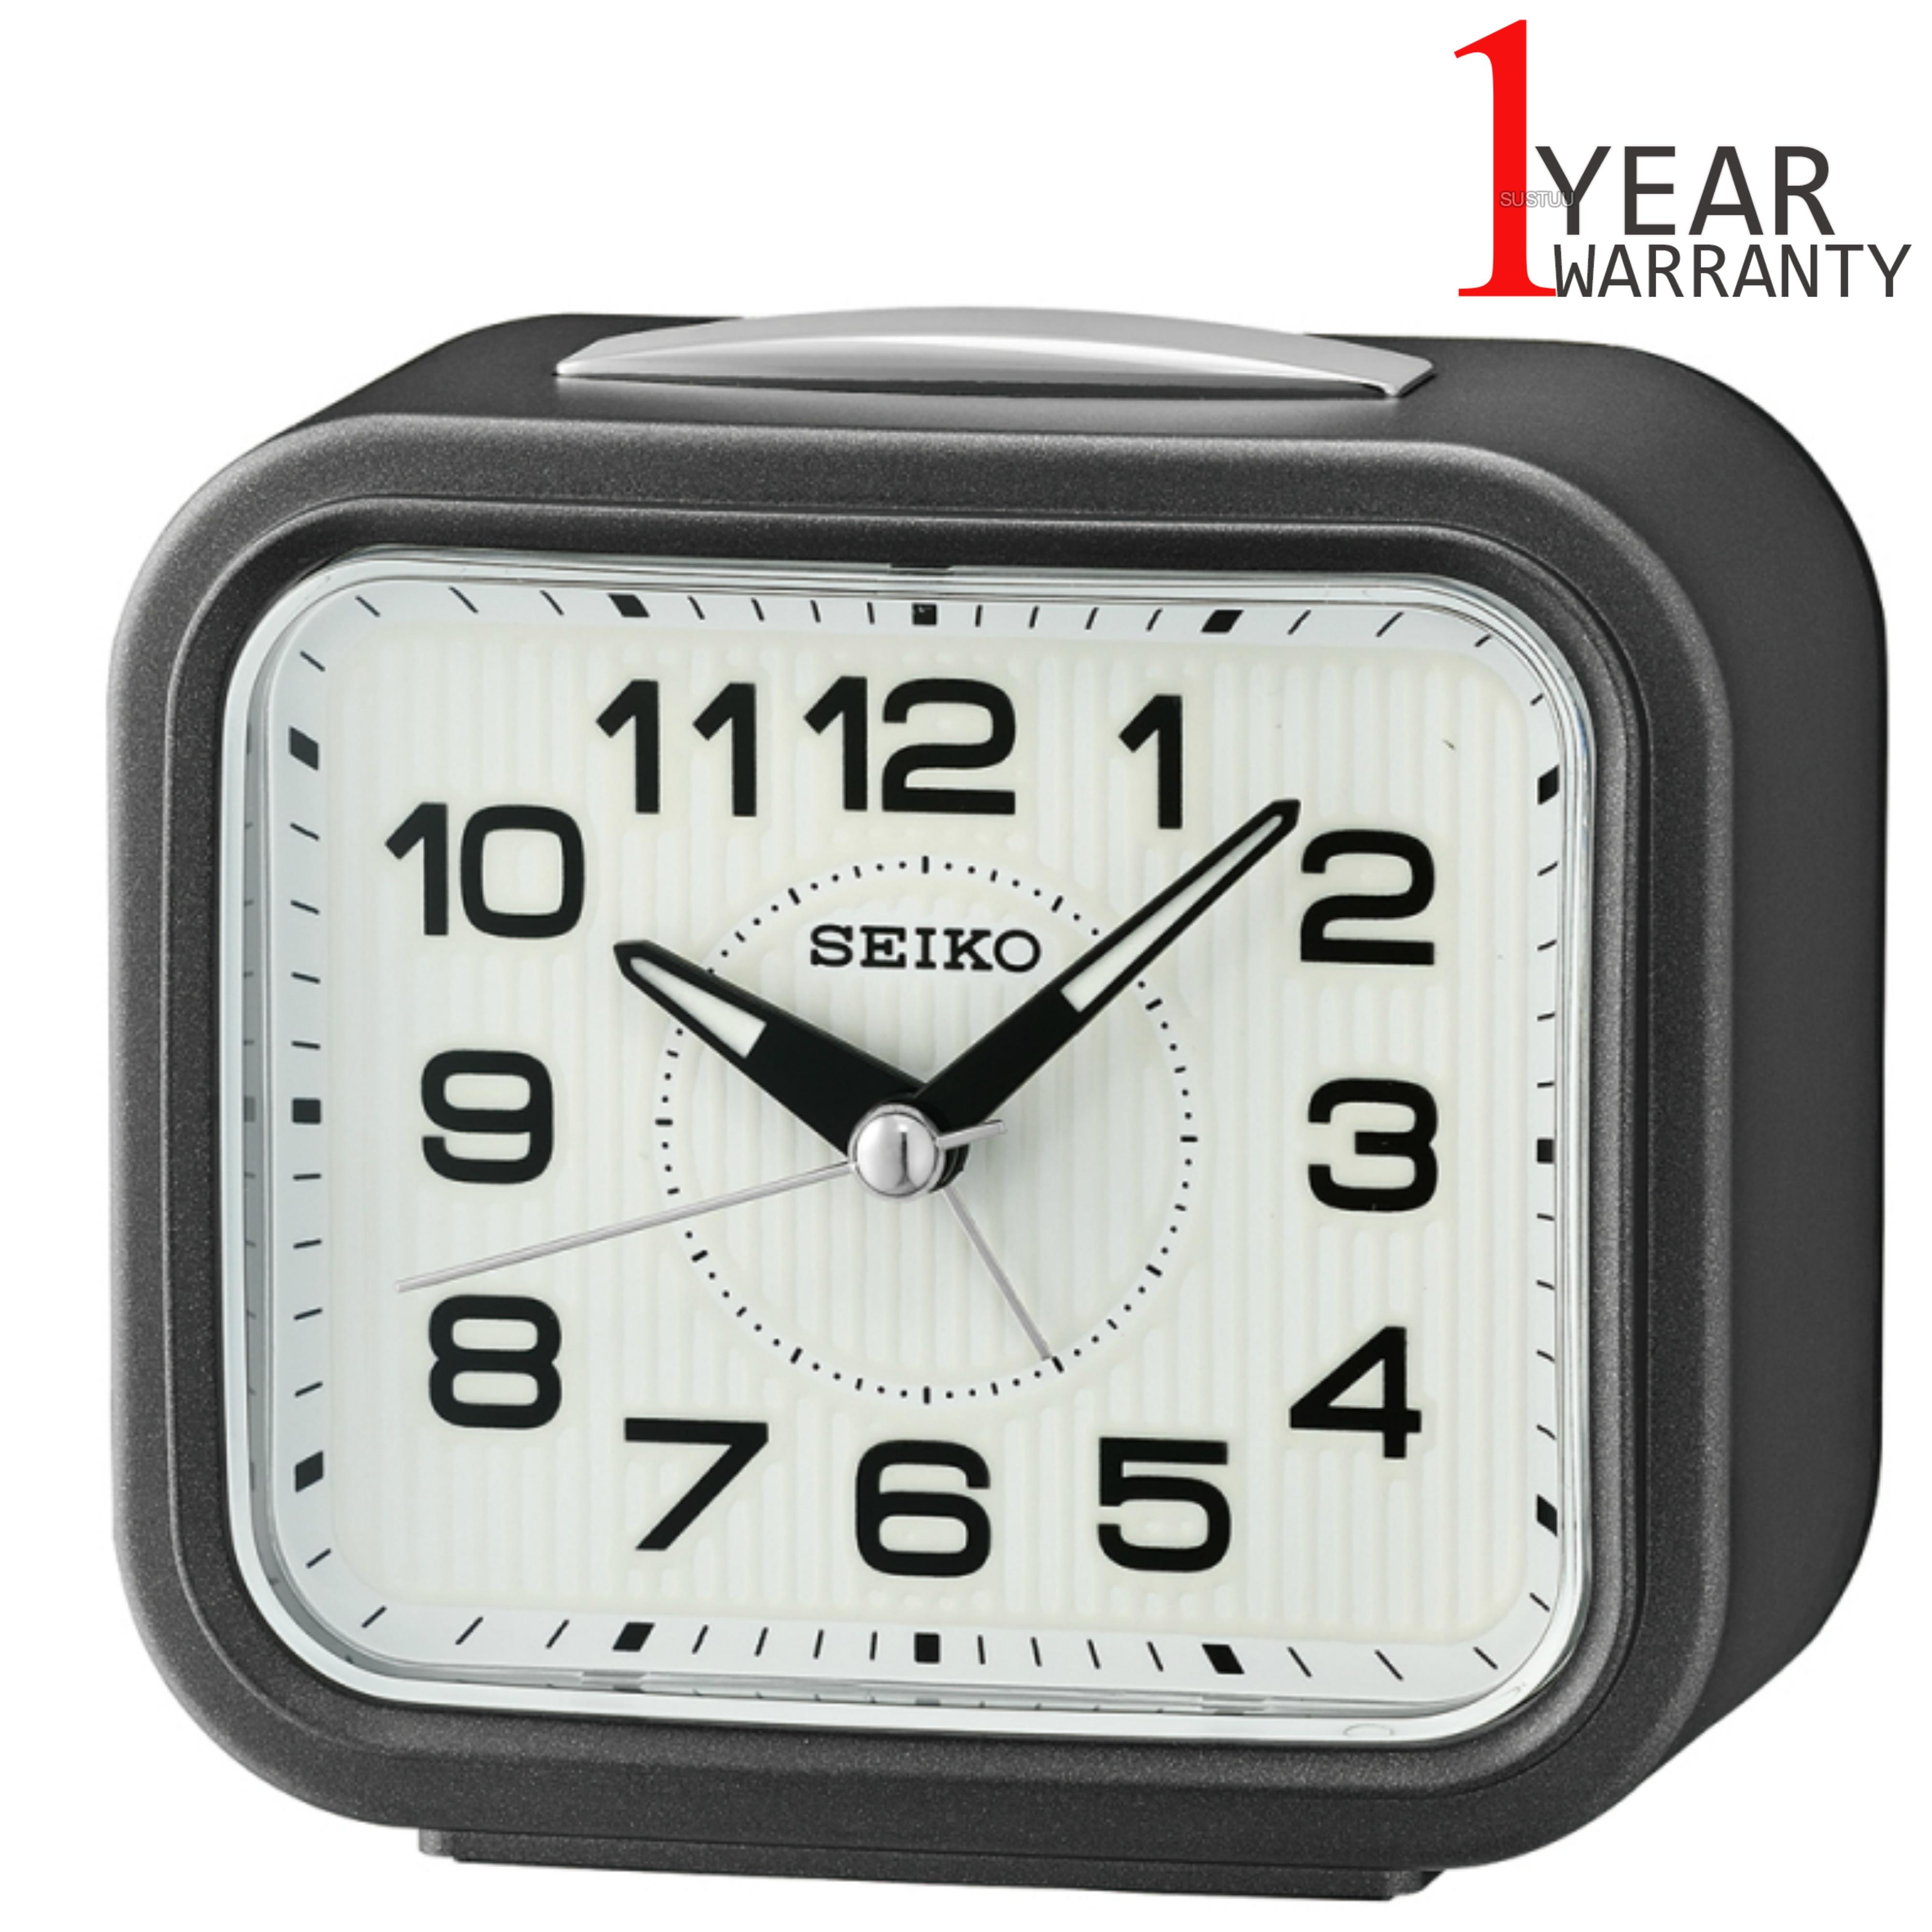 Seiko Bell Alarm Clock With Snooze | Plastic Case | Dark Metallic Grey | QHK050N | NEW